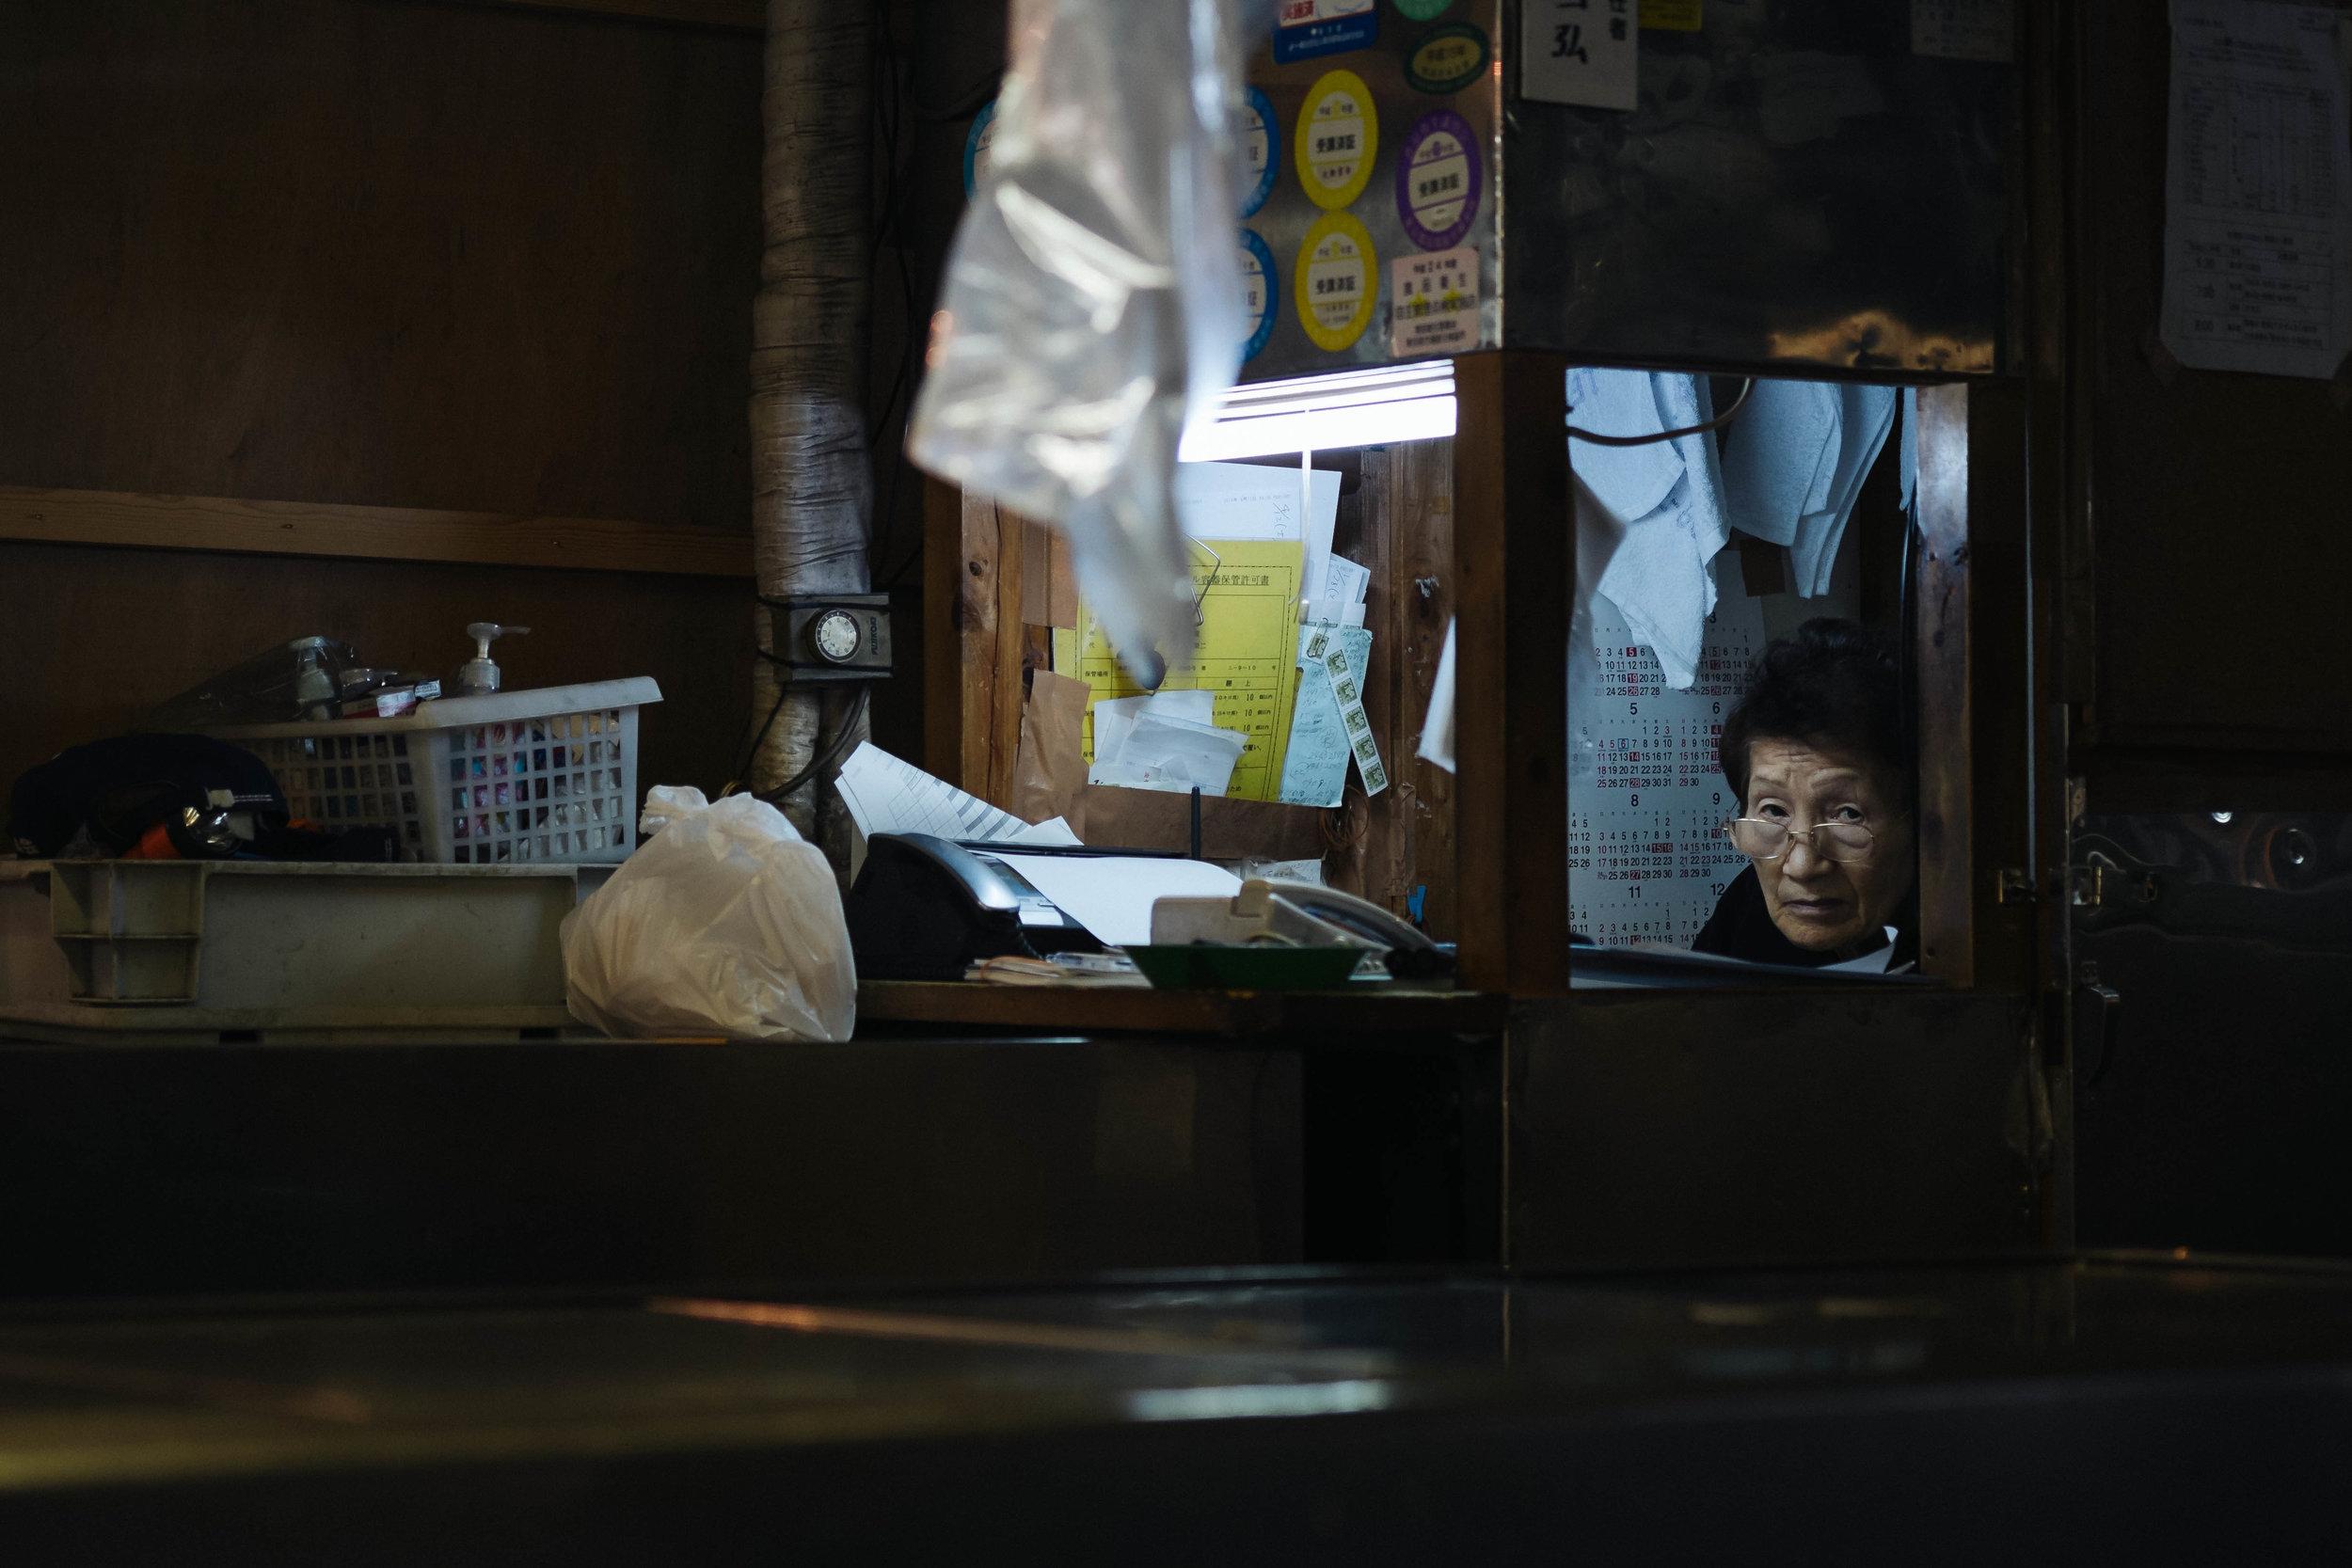 I think she spotted me, Tsukiji Fish Market, Tokyo.